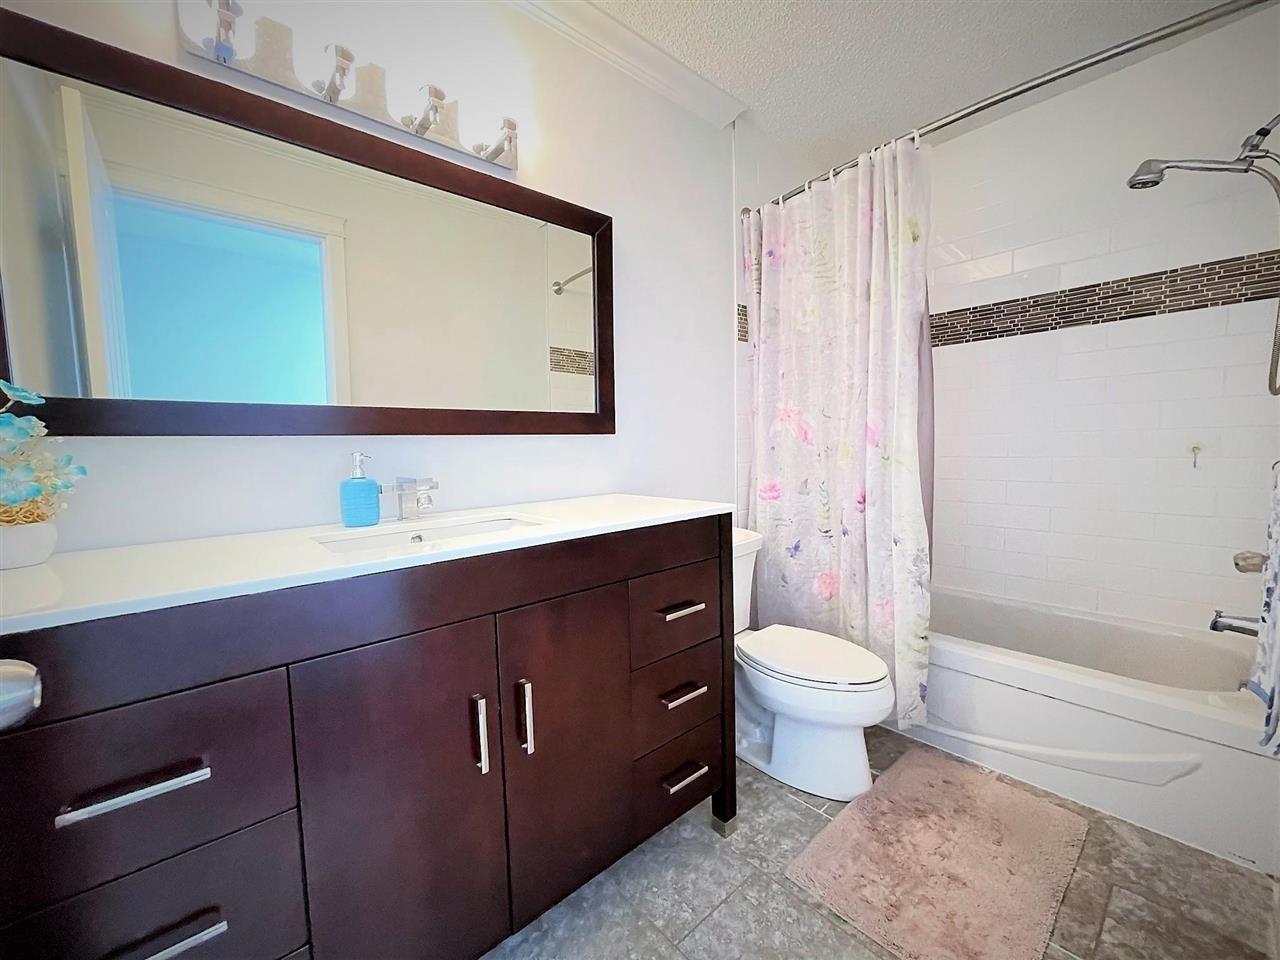 104 9045 WALNUT GROVE DRIVE - Walnut Grove Townhouse for sale, 3 Bedrooms (R2588351) #34